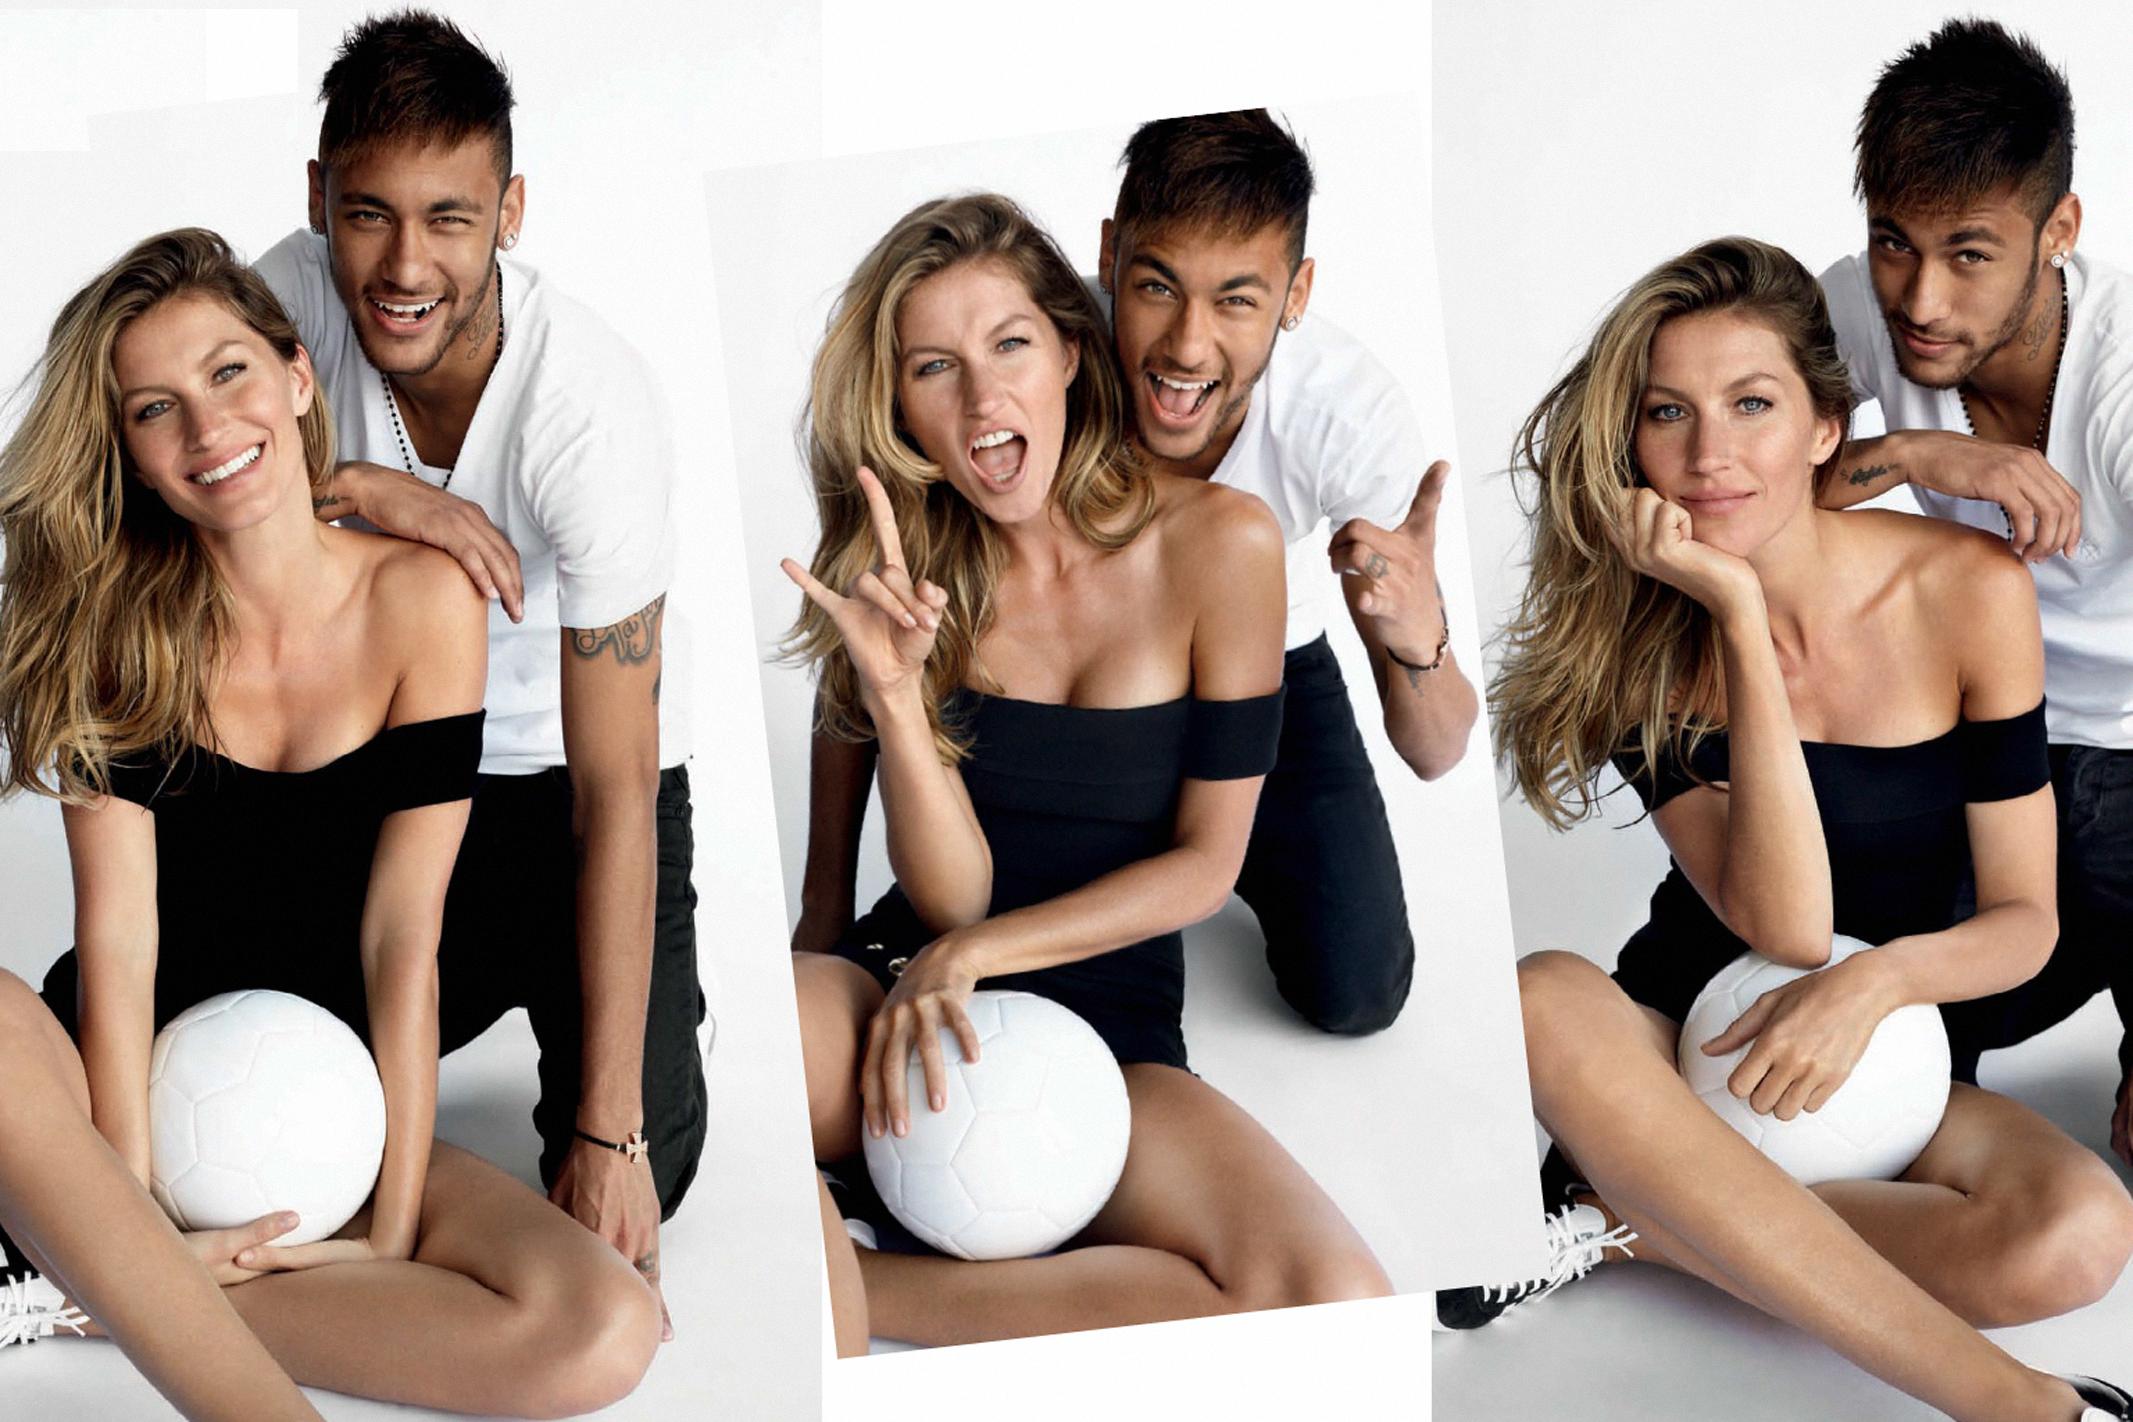 gisele-bc3bcndchen-neymar-jr-by-mario-testino-for-vogue-brazil-june-2014-4_0